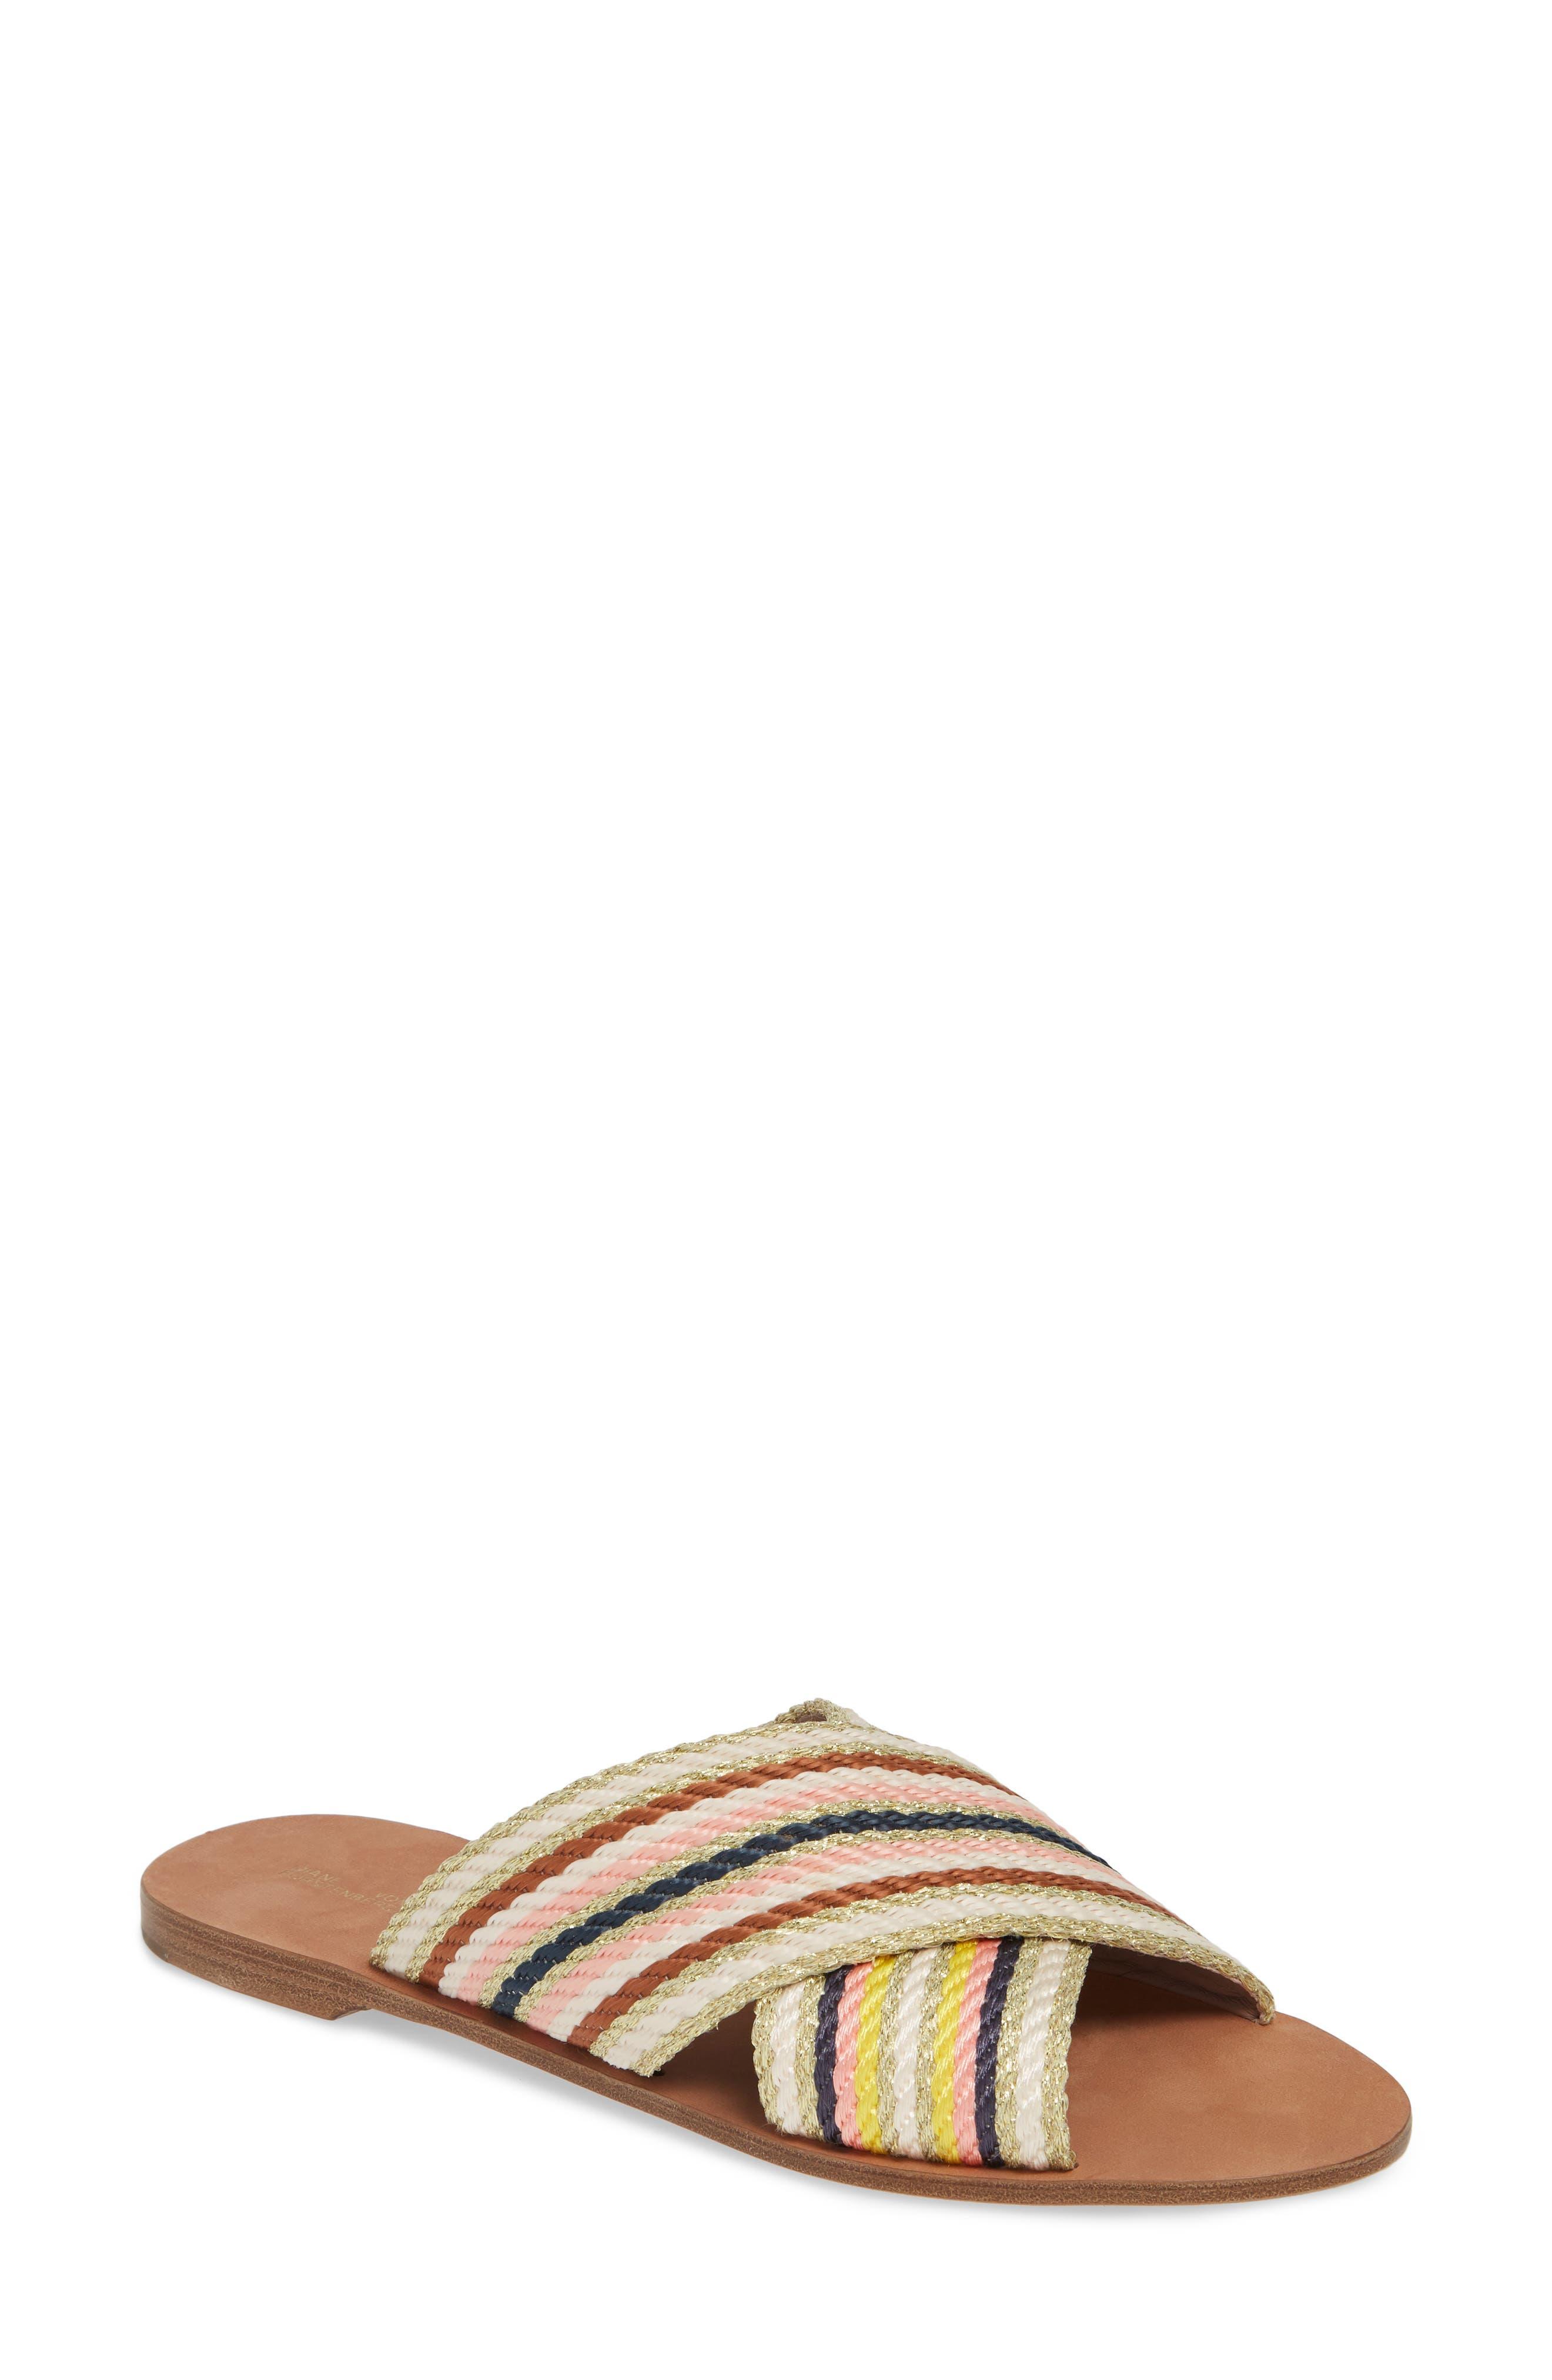 Diane Von Furstenberg Cindi Woven Slide Sandal, Ivory